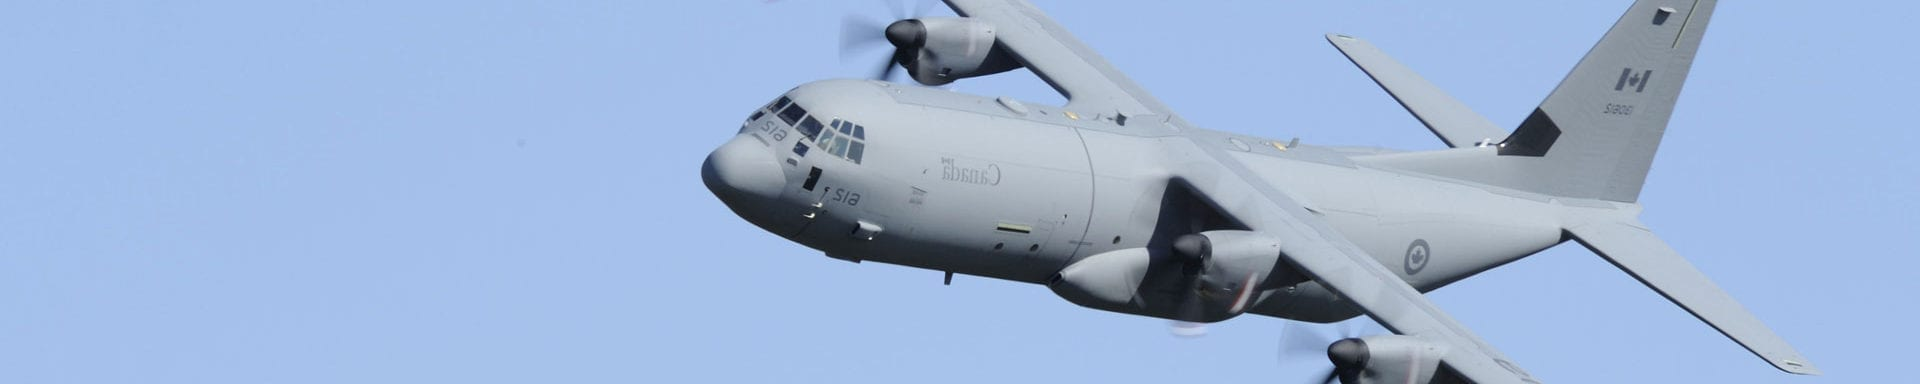 AAE Aerospace Filters & Valves - AAE   Aircraft Appliances